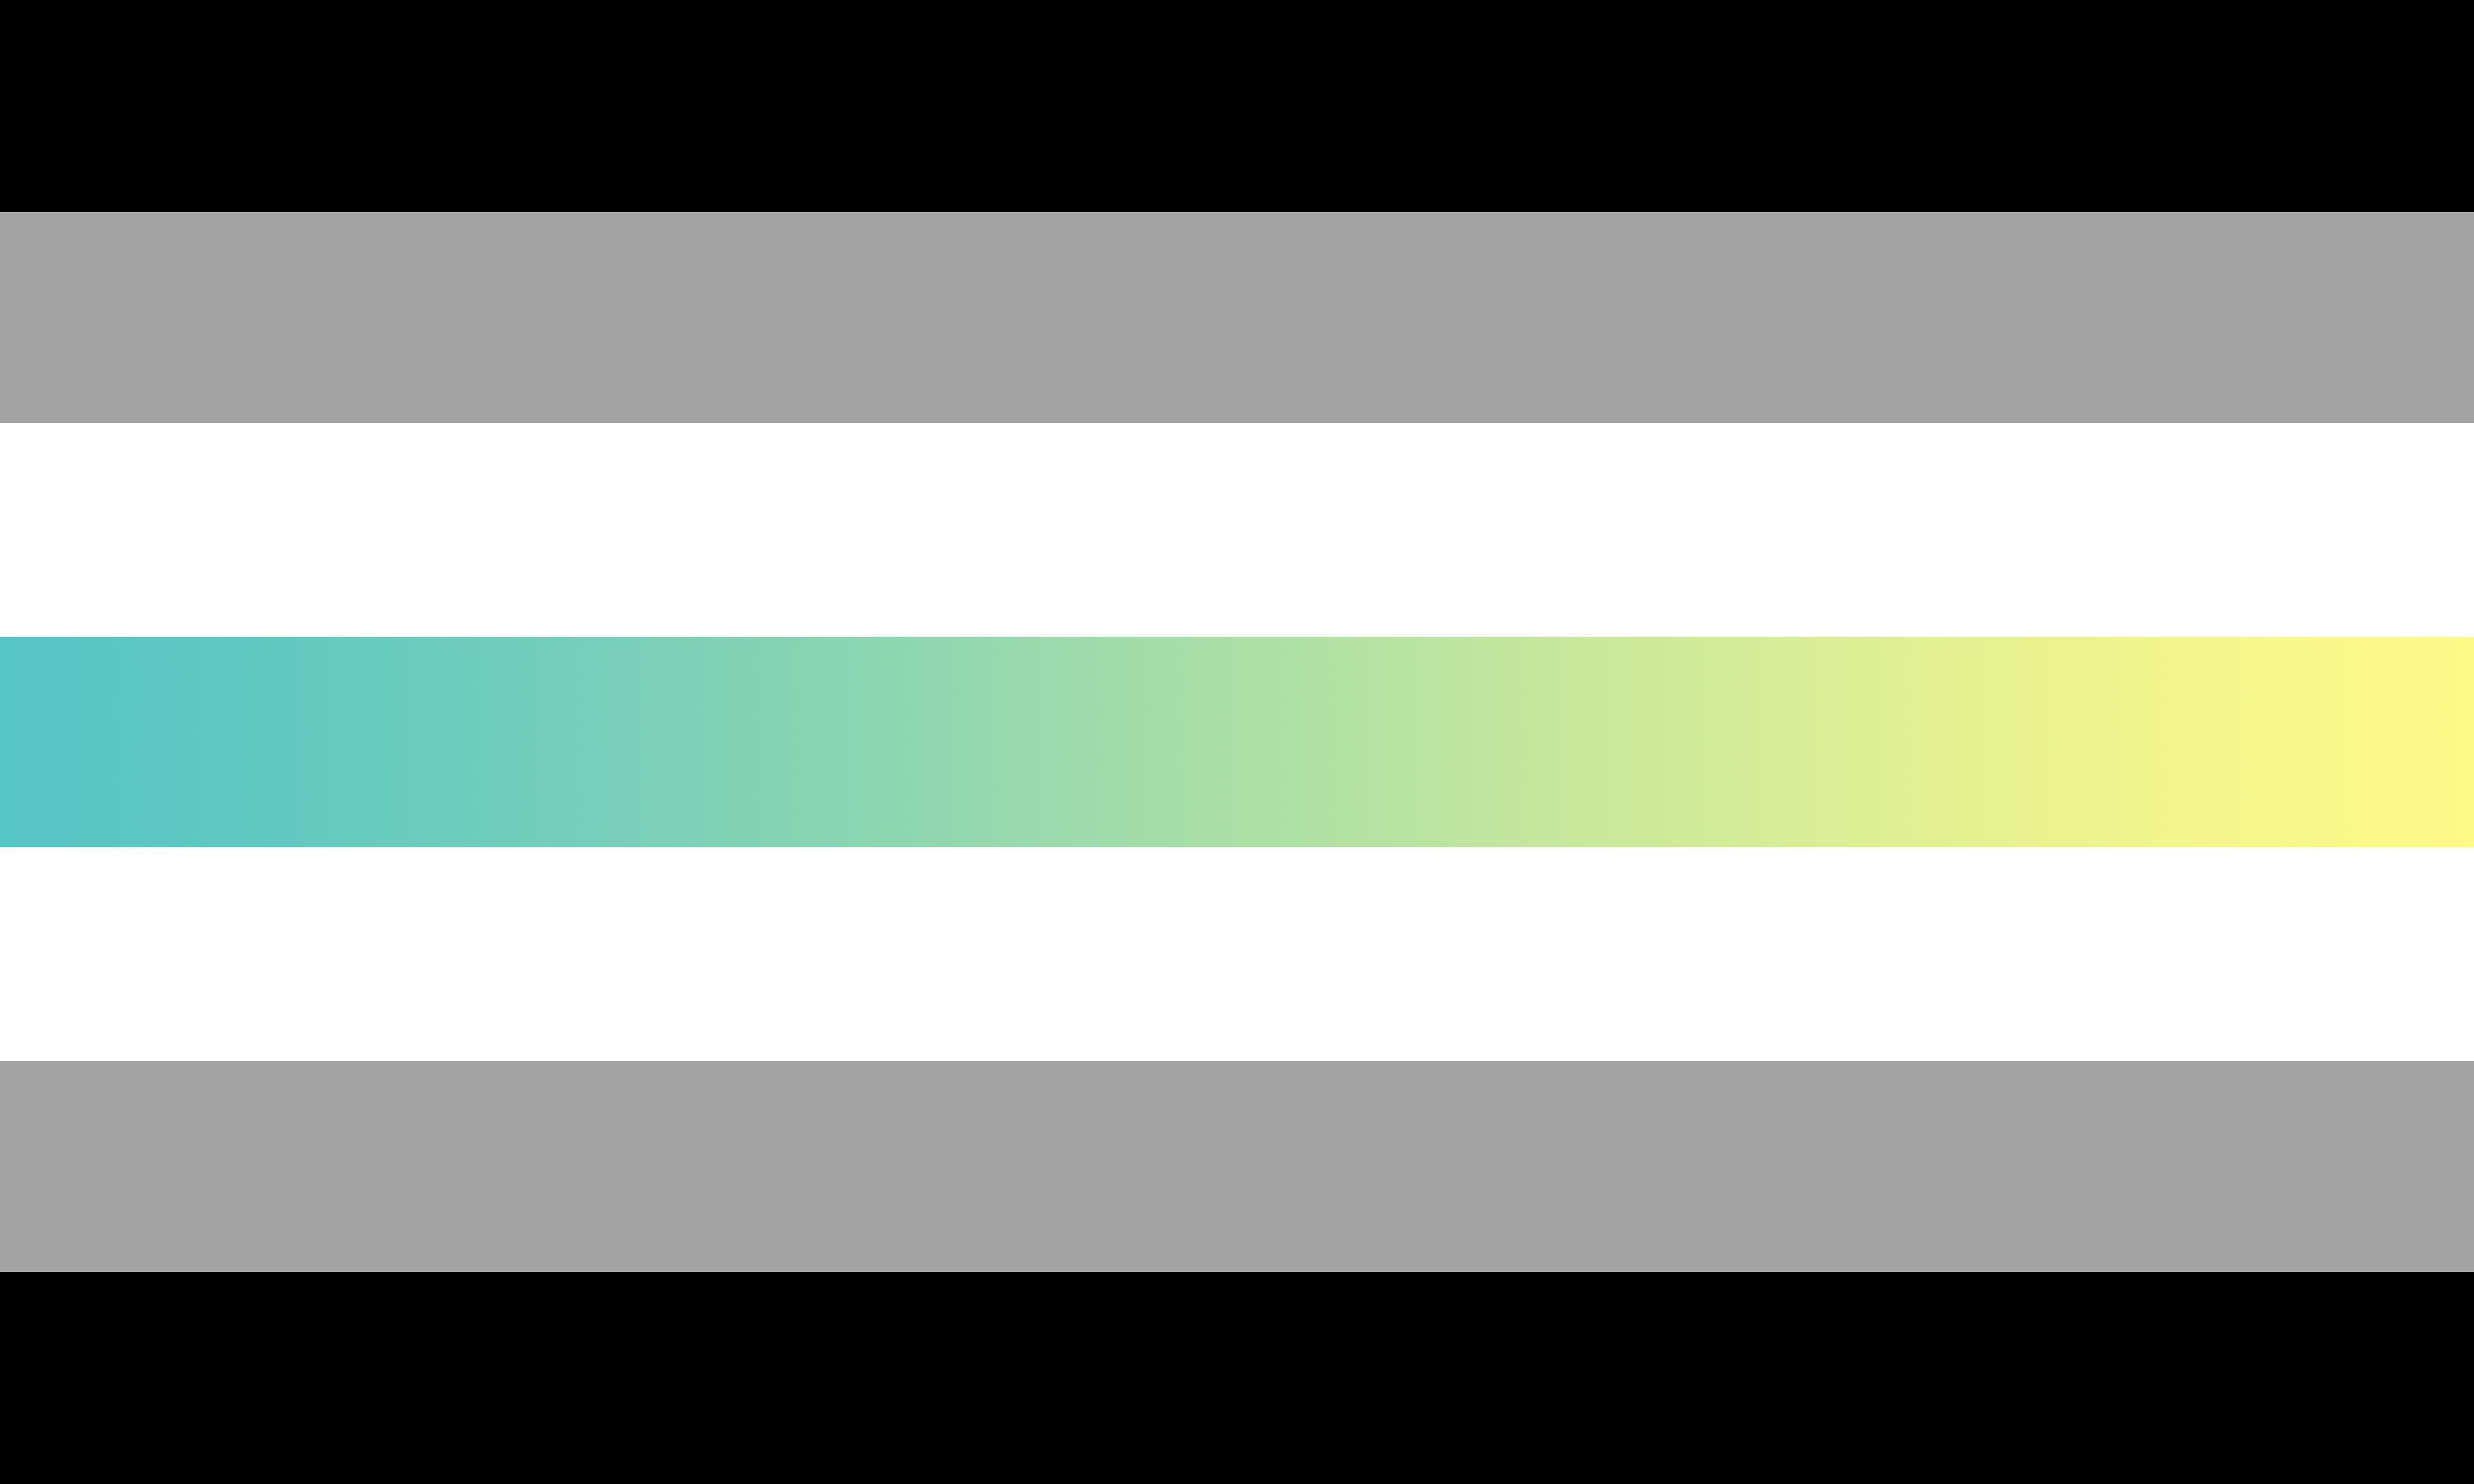 Librafluid (Masculine - Nonbinary) (1) by Pride-Flags